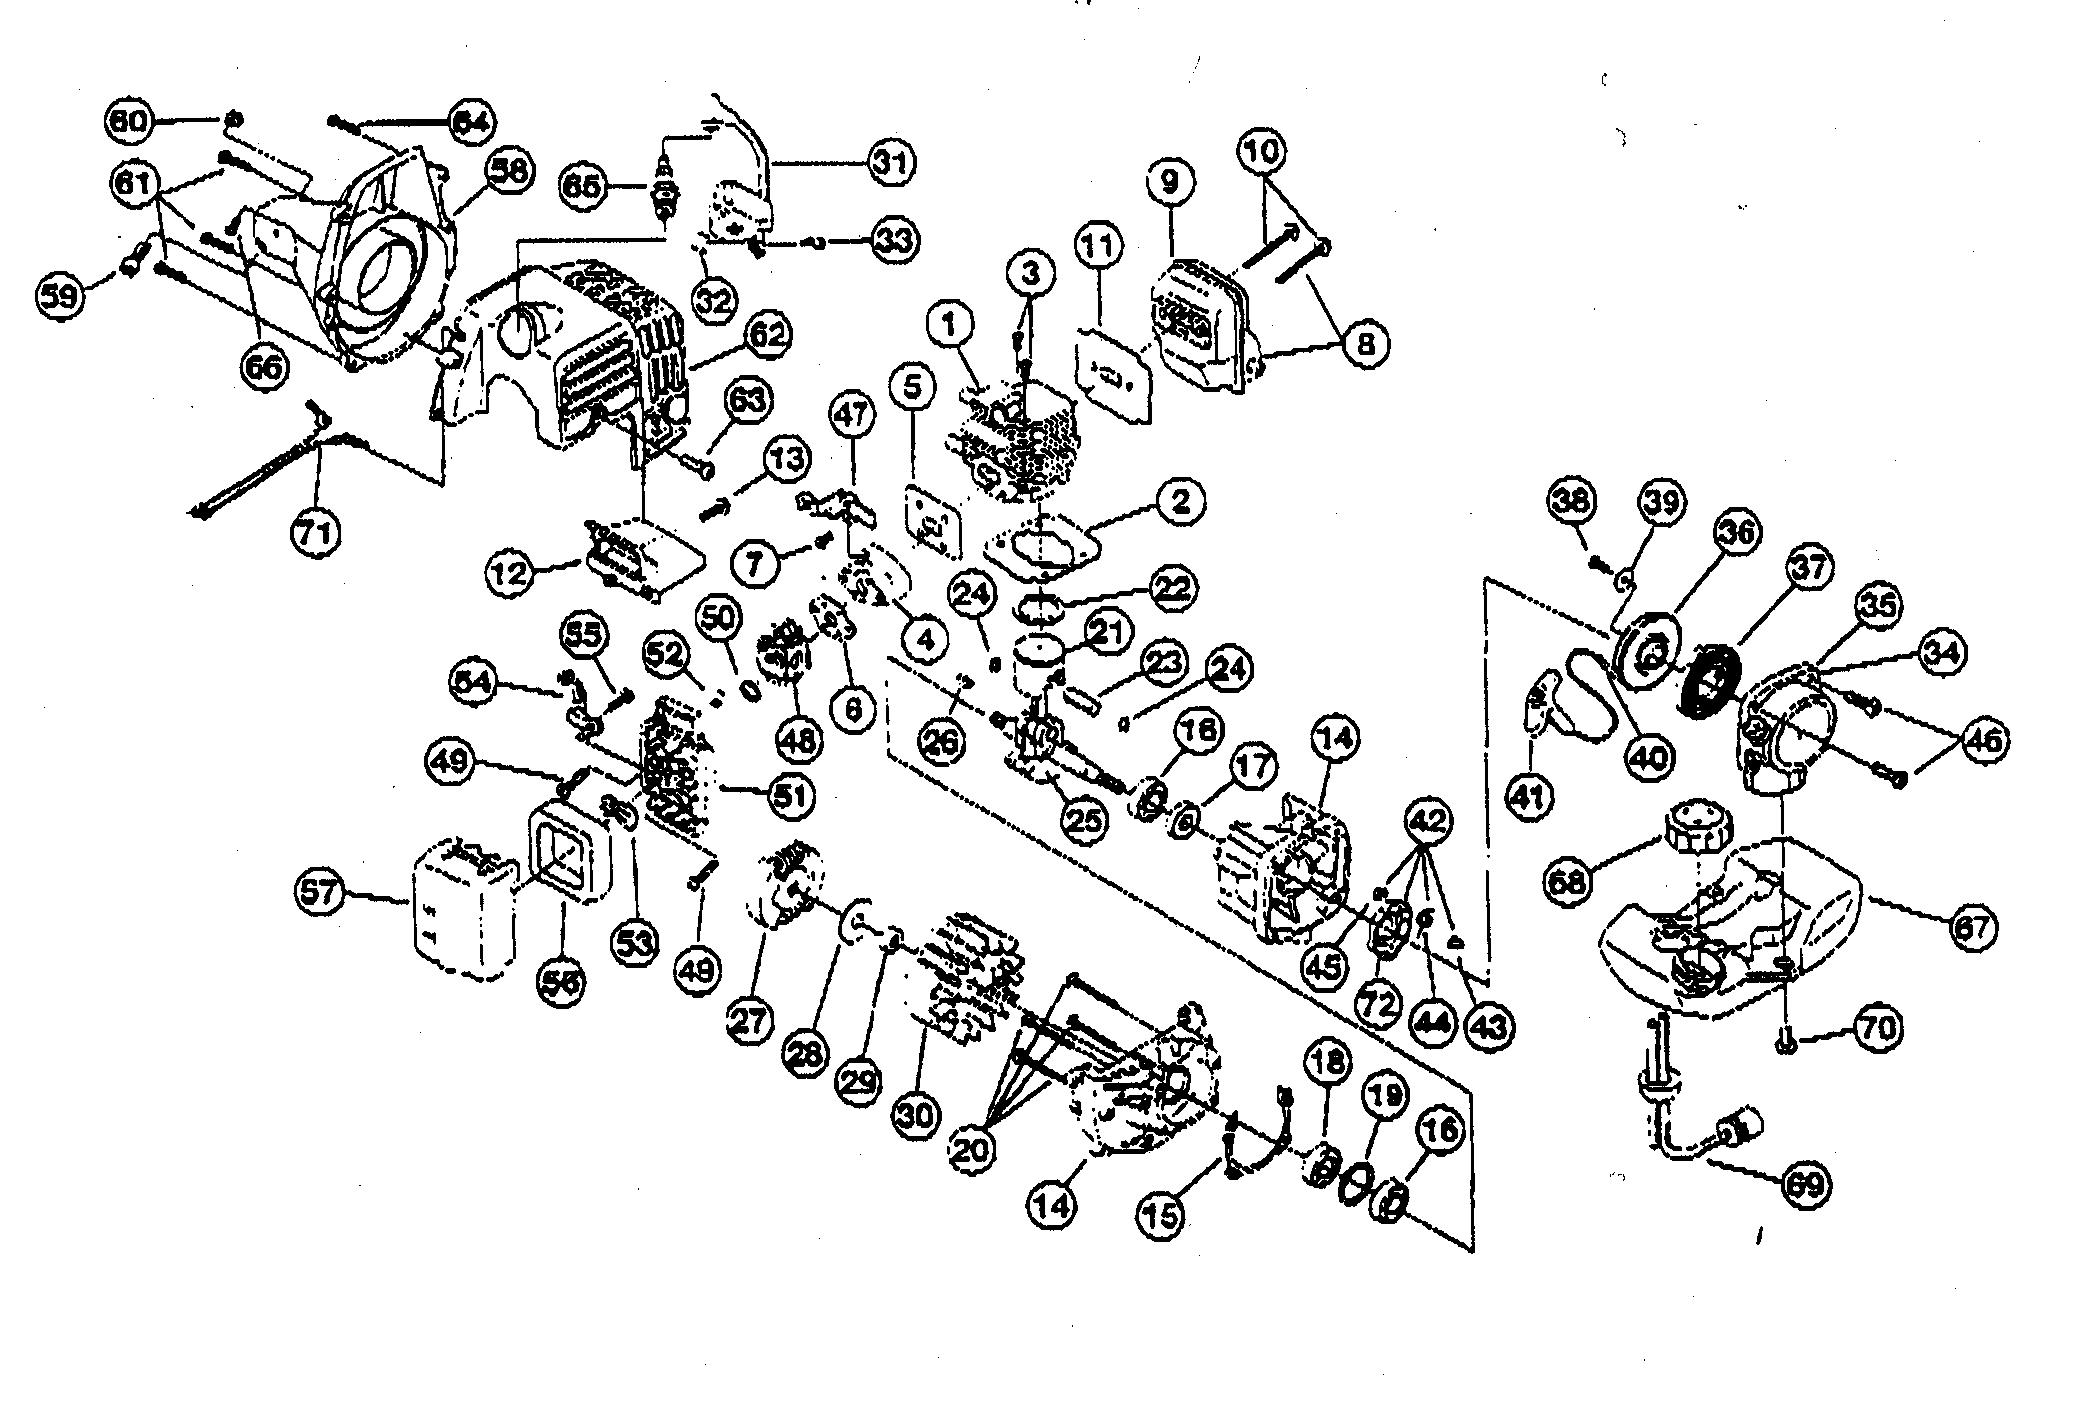 Ryobi Engine Diagram Schematic Diagrams P2006 Parts List And Ereplacementpartscom String Trimmer Waitting Co